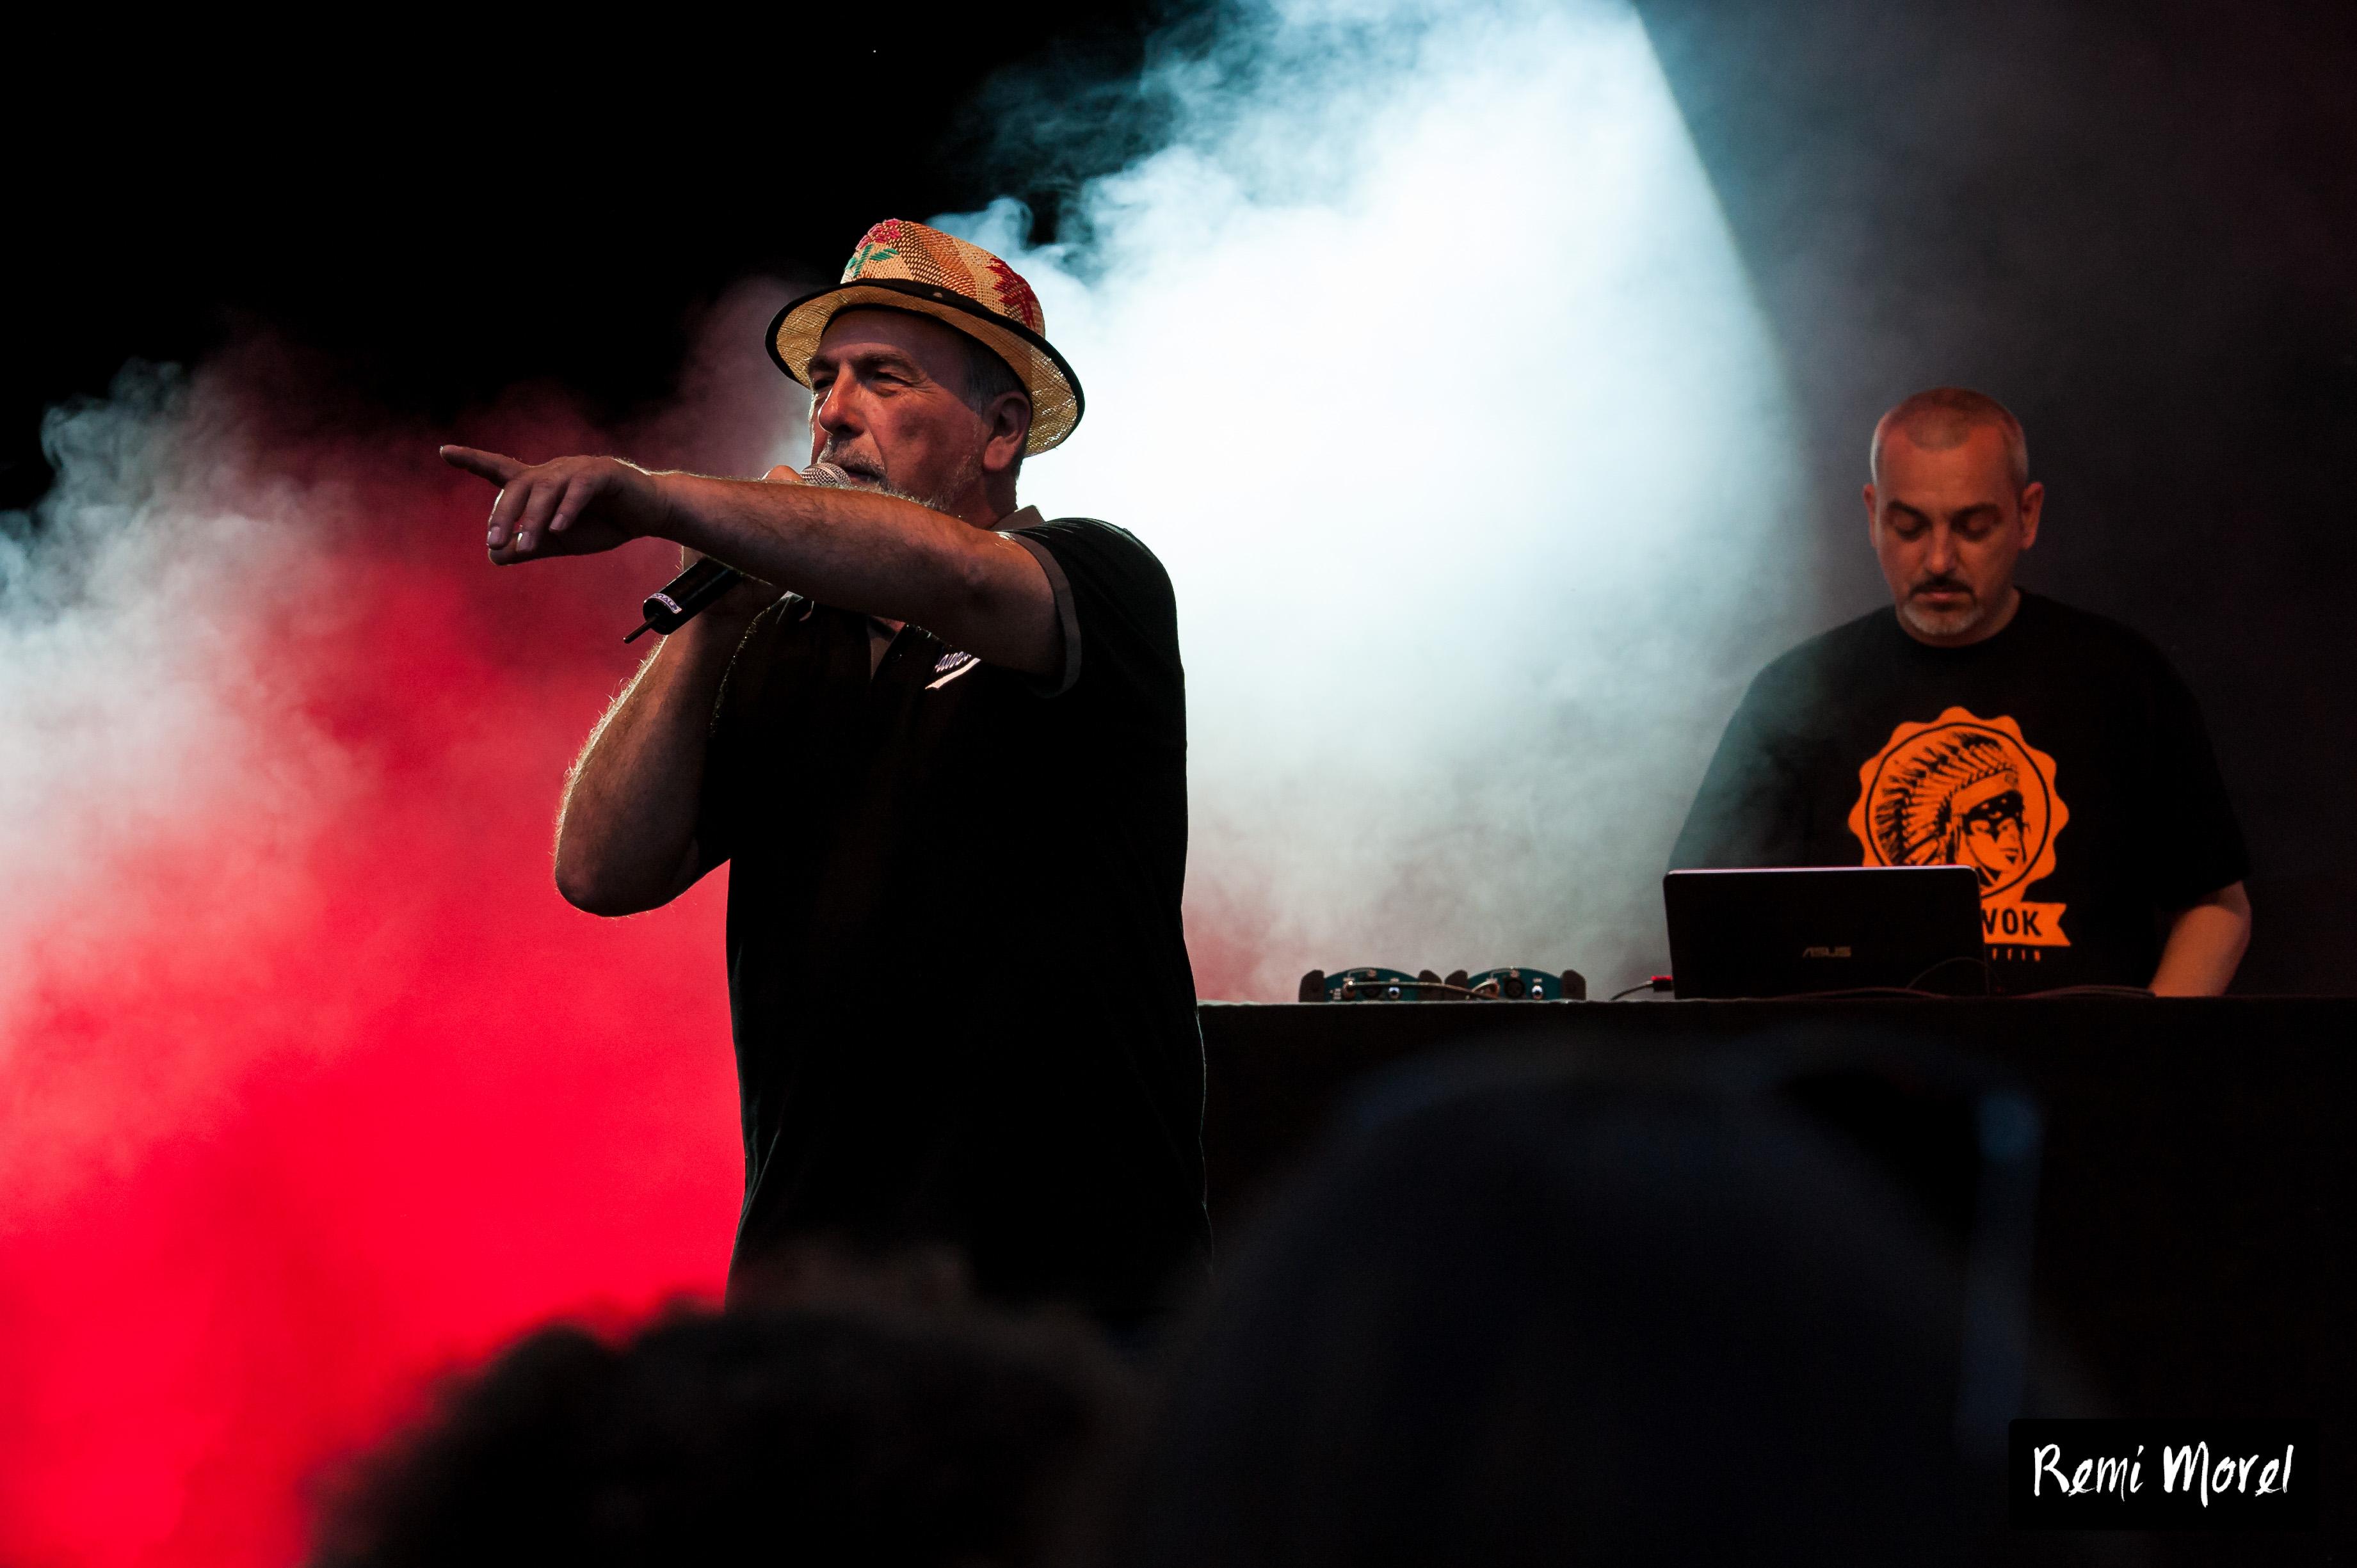 remi-morel-tradin-festival-papet-j-3